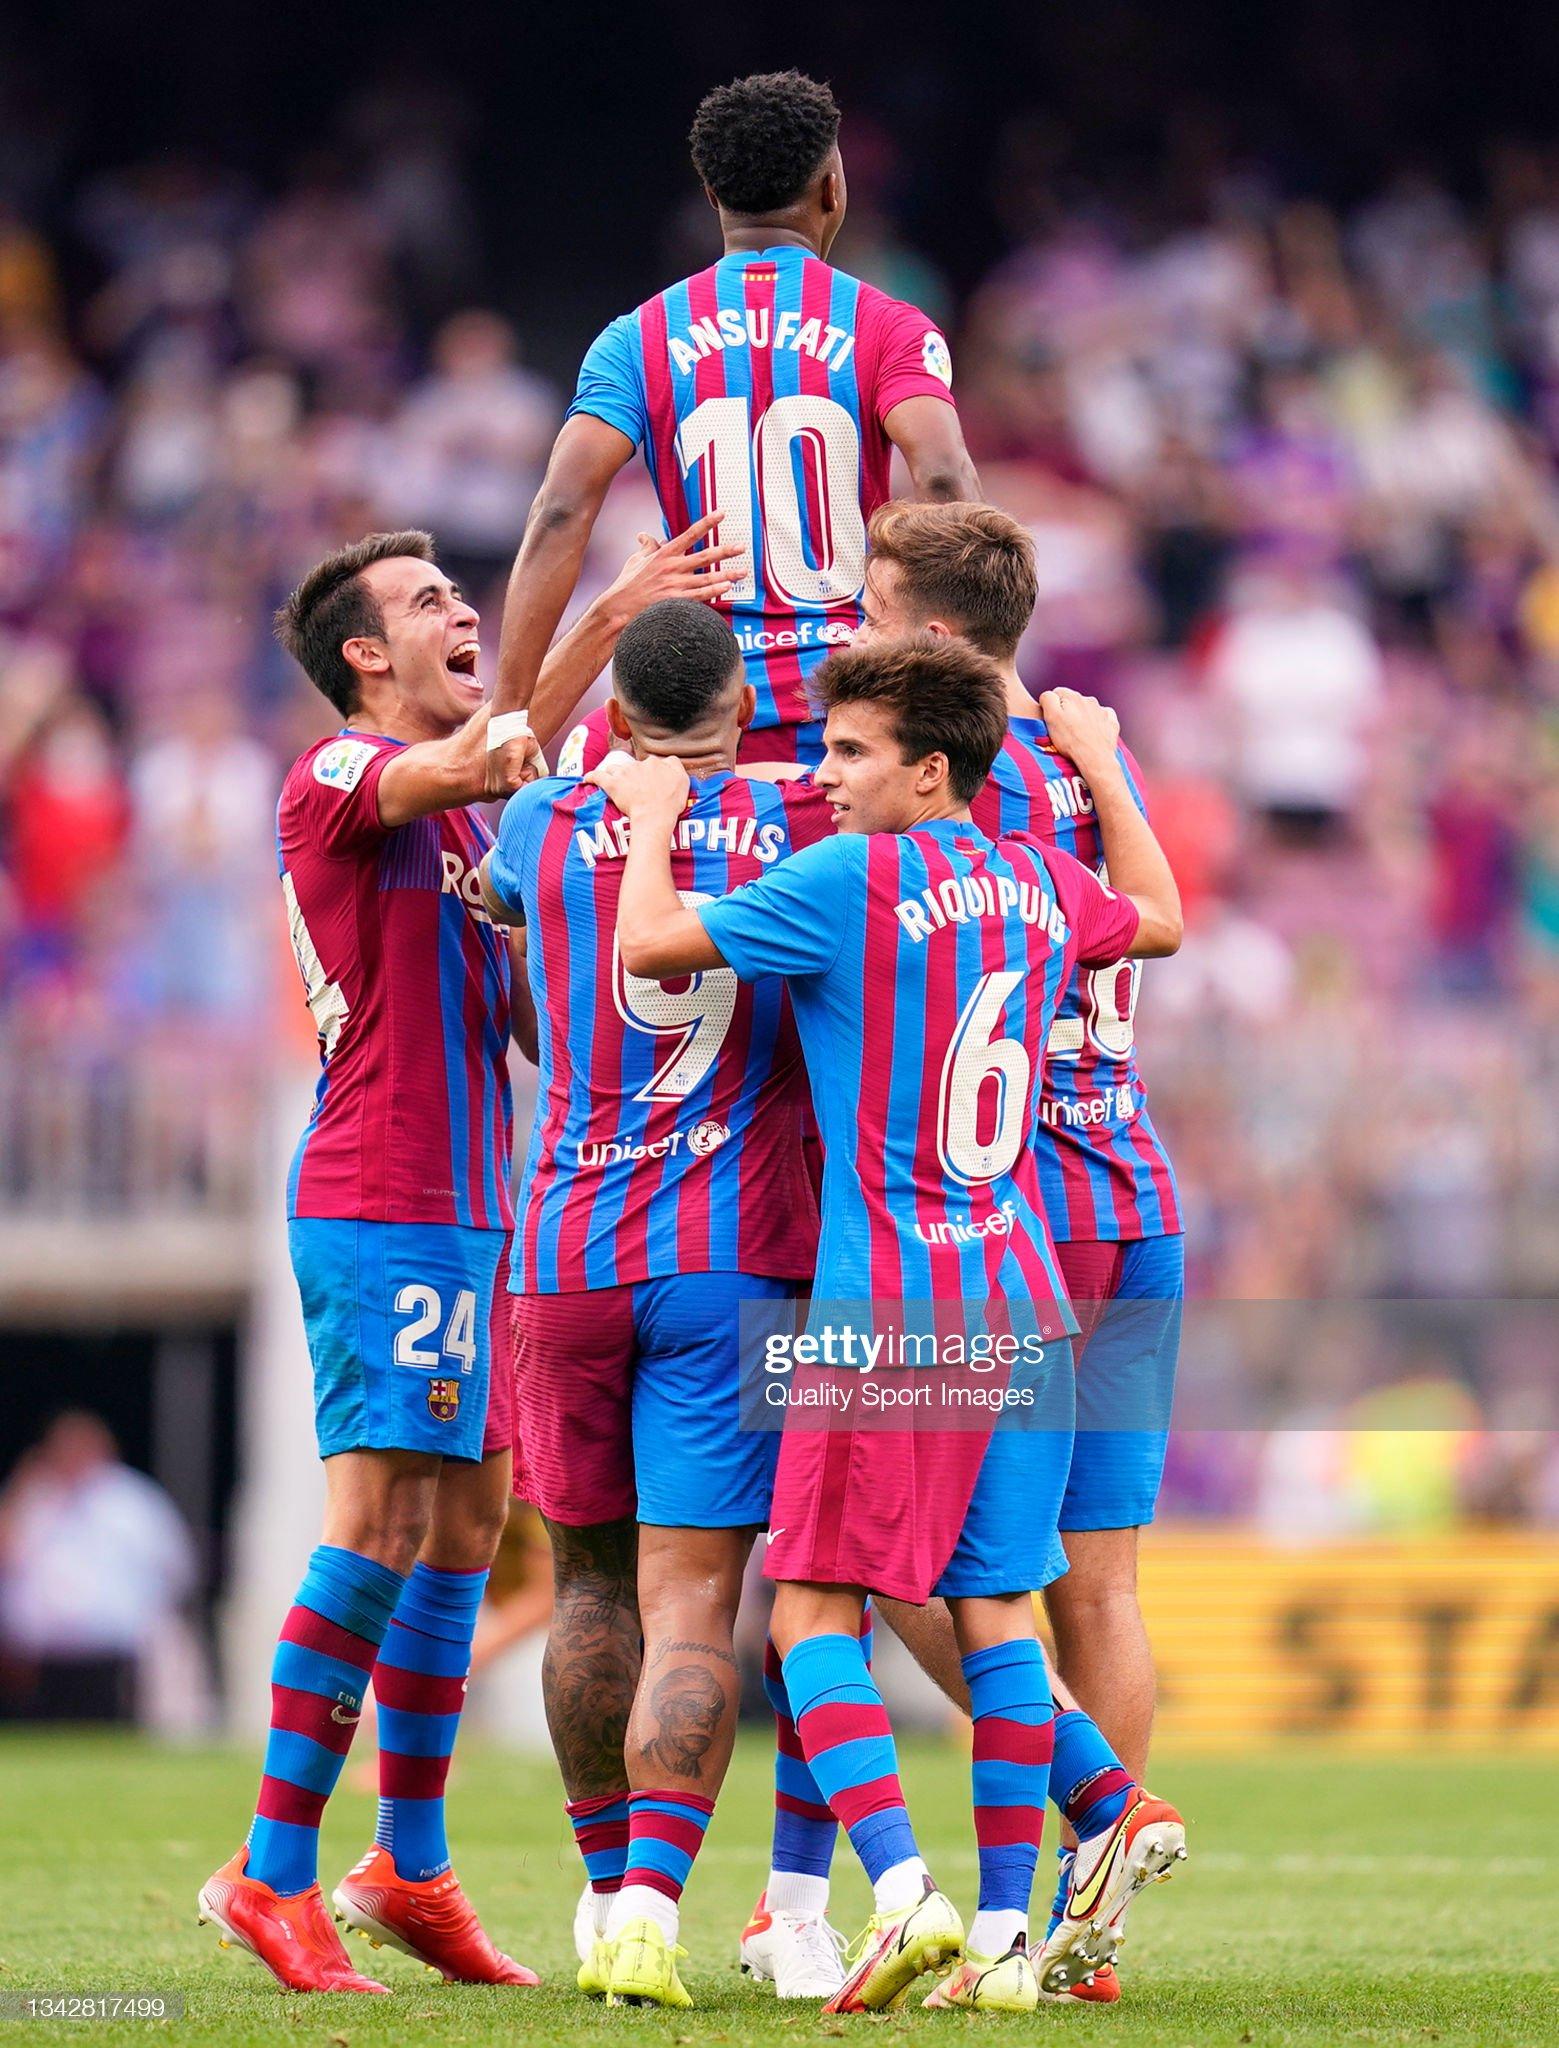 Ansu Fati - Page 3 Ansu-fati-of-fc-barcelona-celebrates-with-team-mates-after-scoring-picture-id1342817499?s=2048x2048